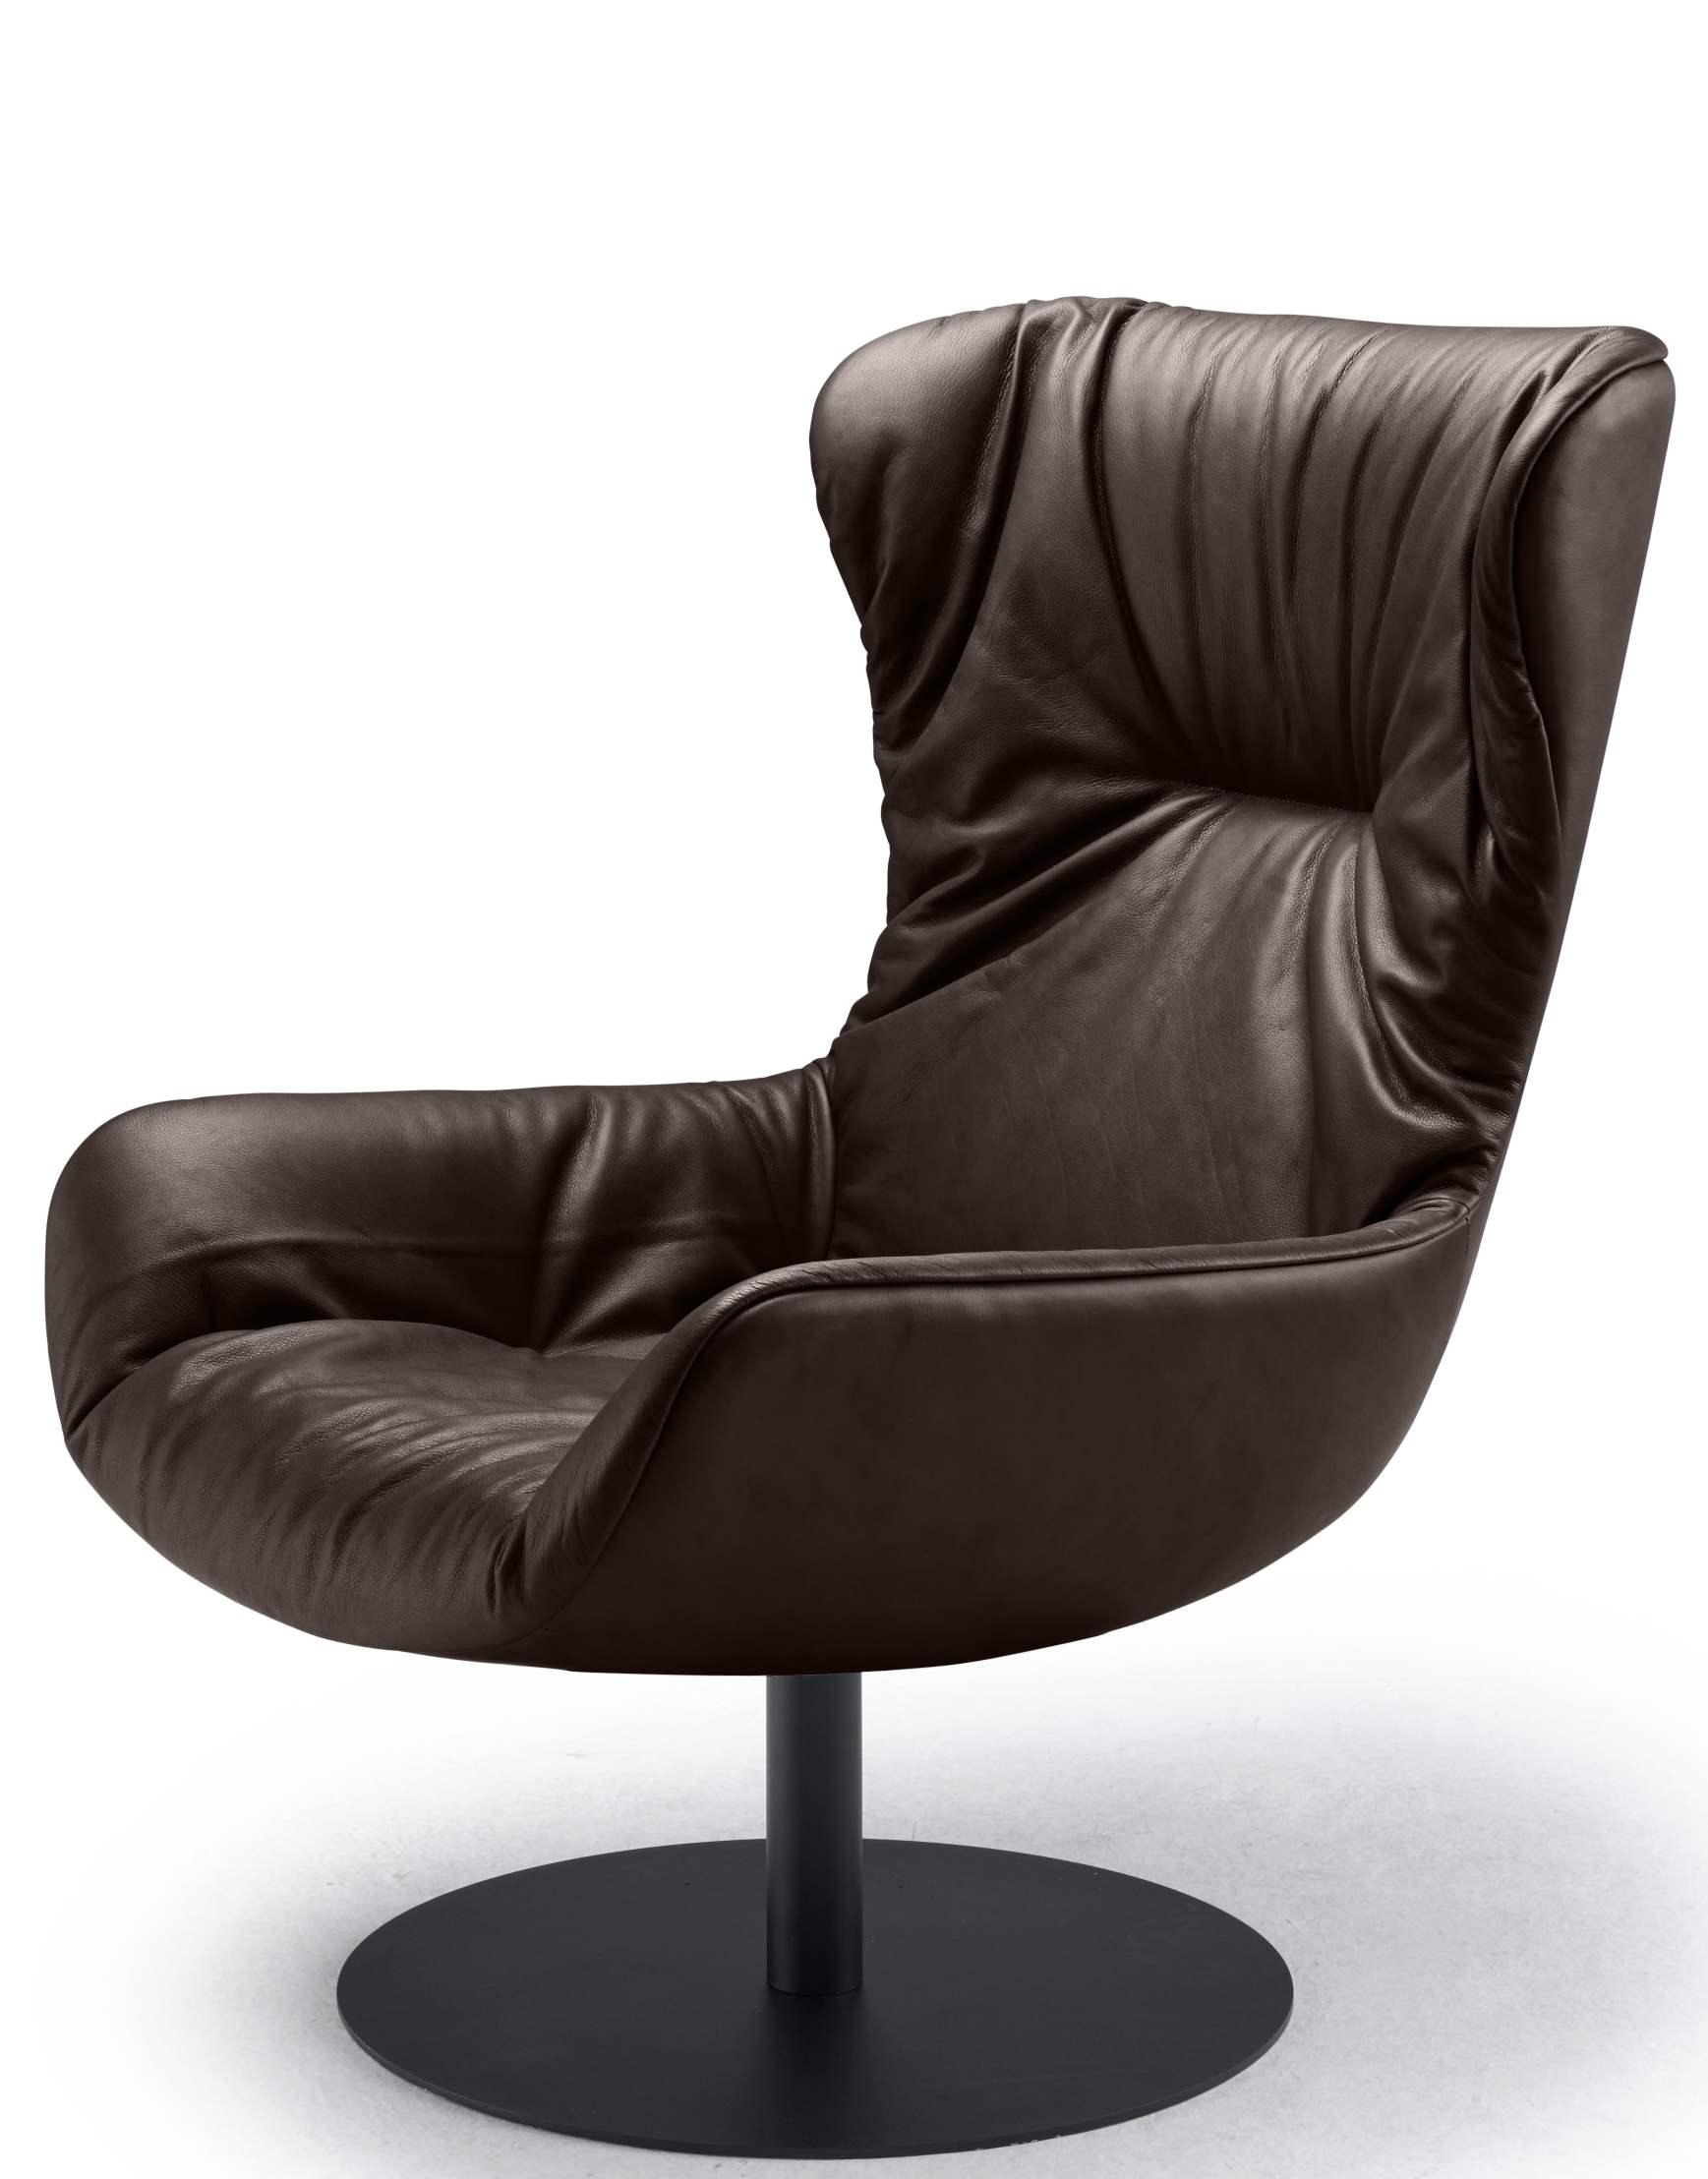 Leya Wingback Ohrensessel Freifrau Sitzmöbelmanufaktur